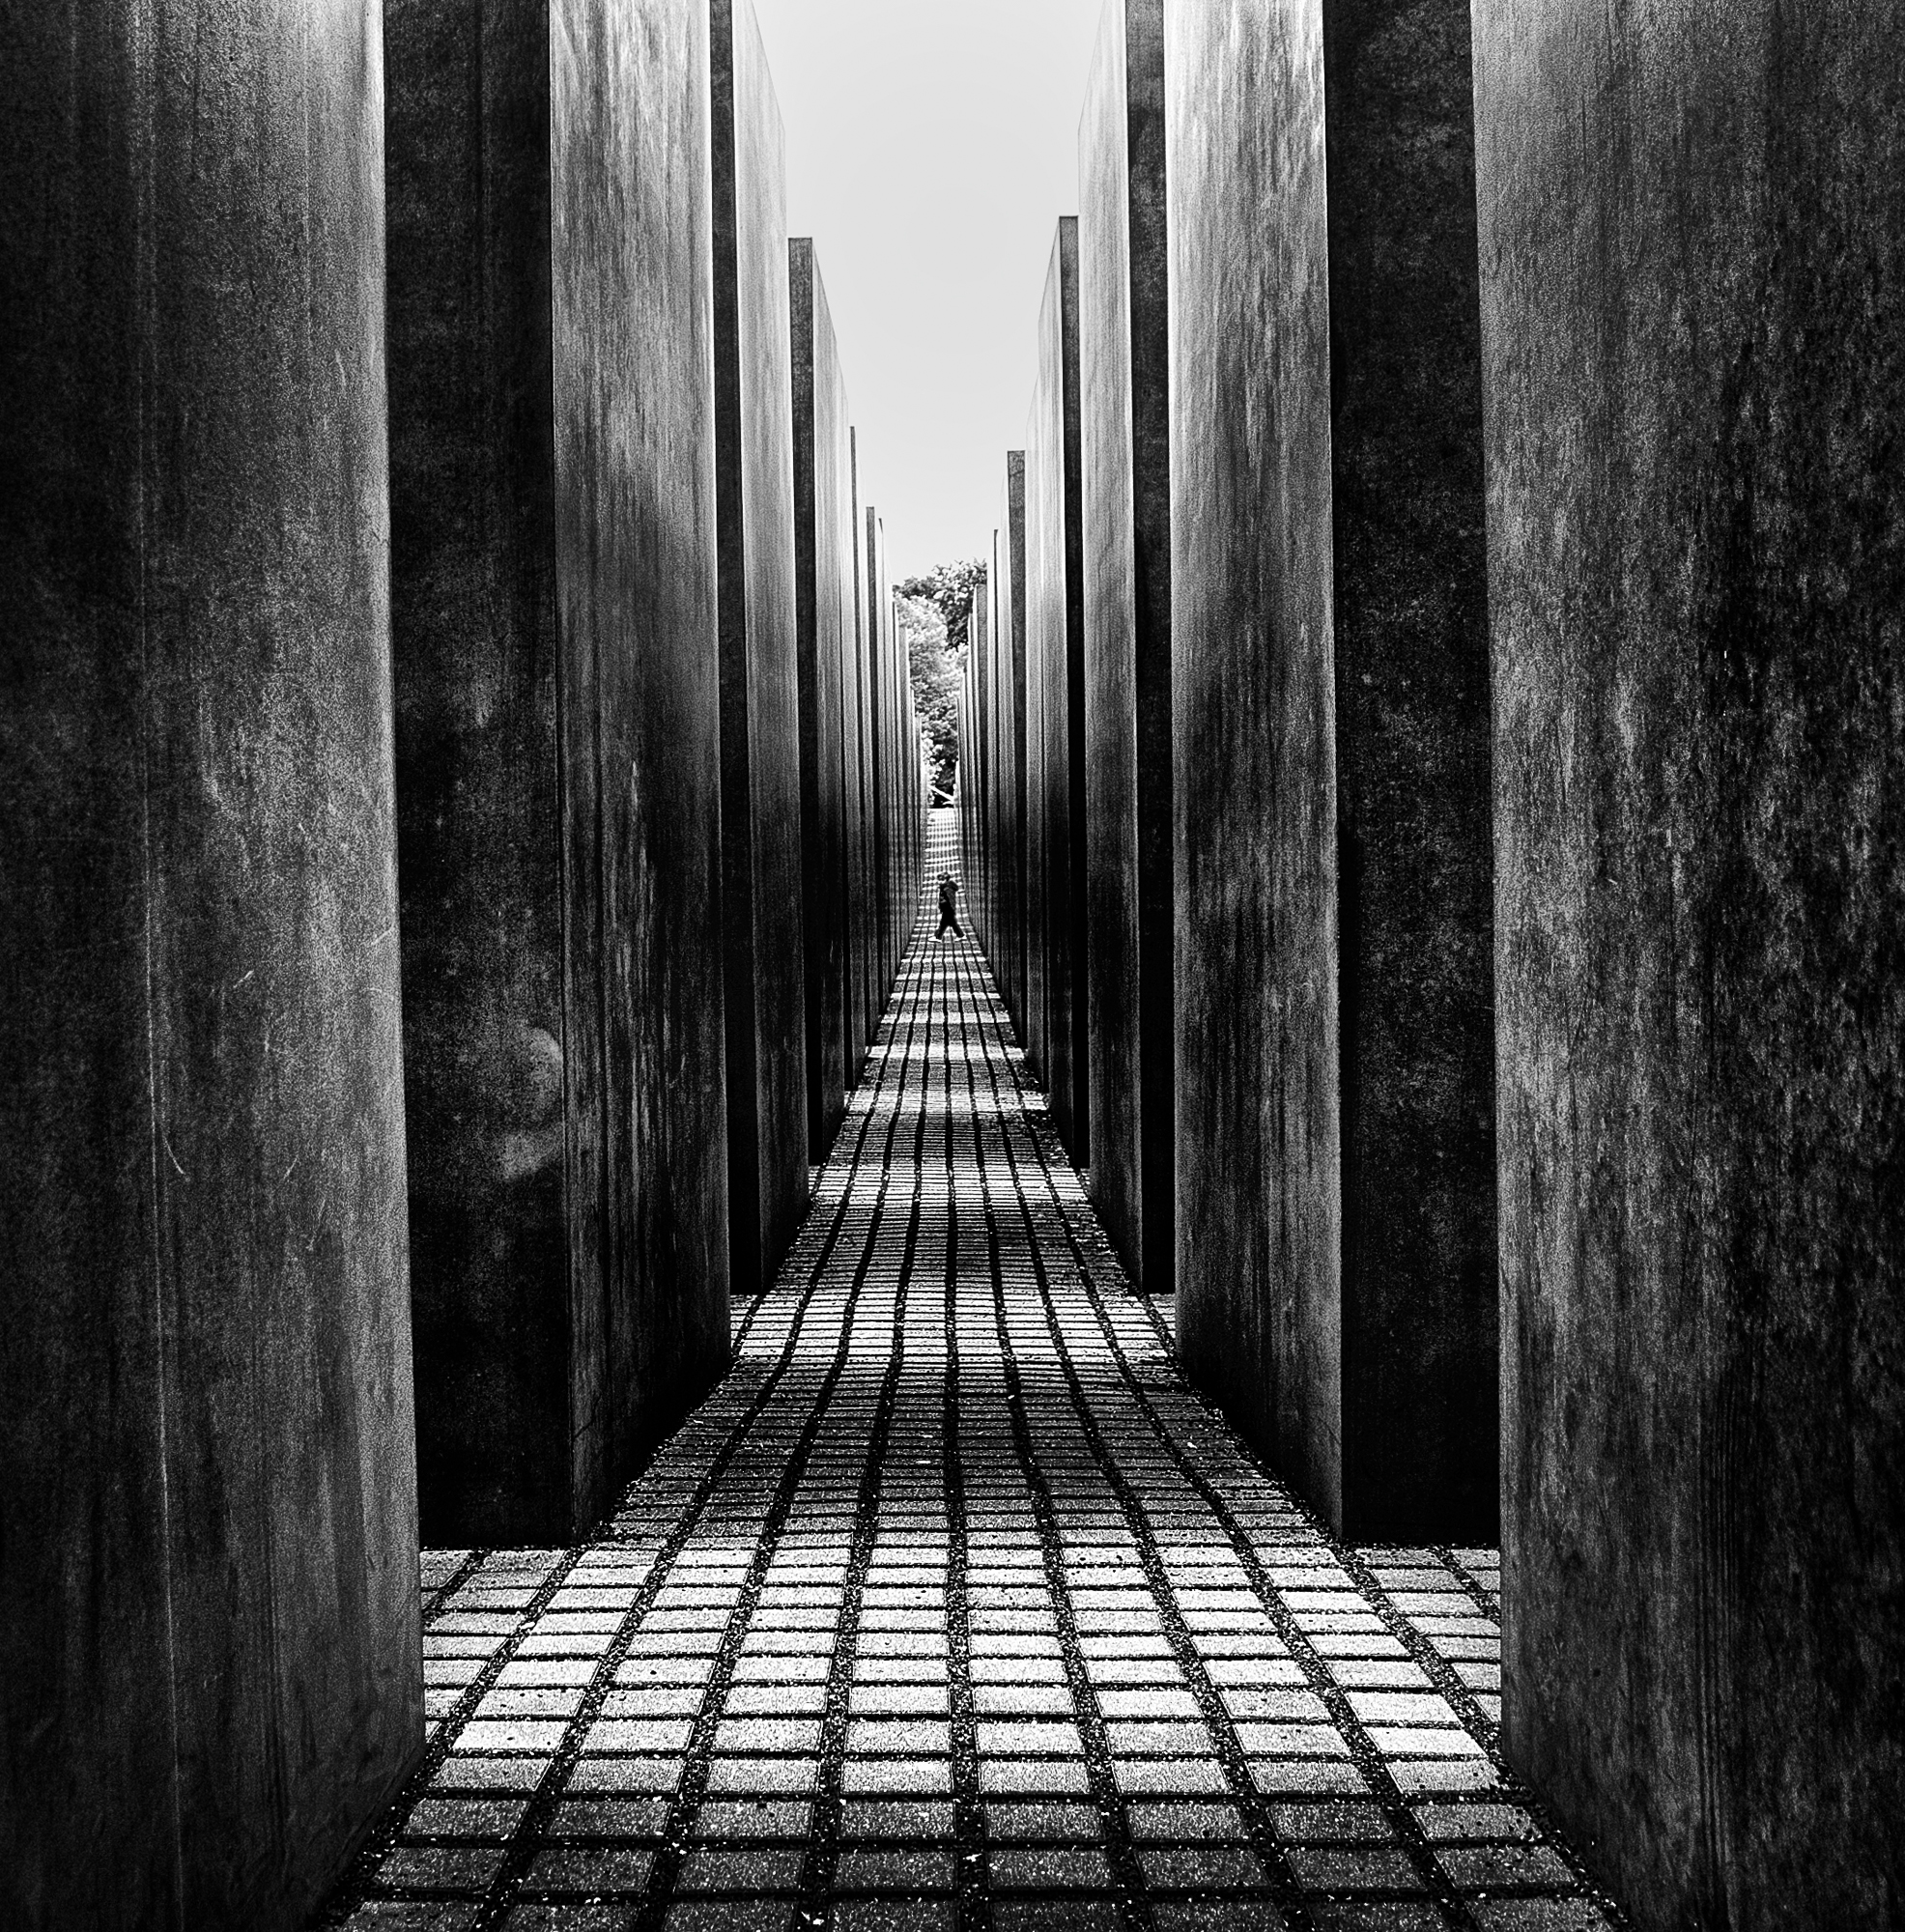 holocaust fine berlin most street memorial galleries landscape place